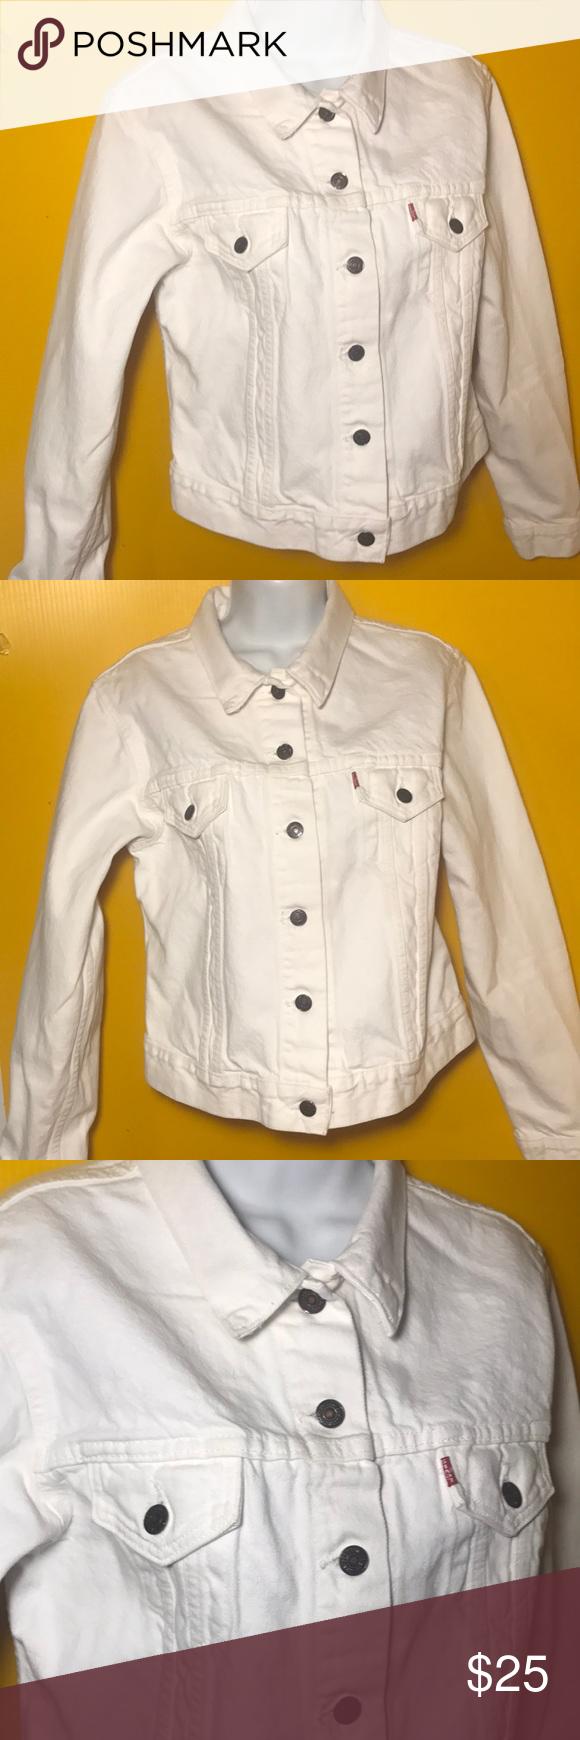 Levi S White Jean Denim Button Up Jacket Size M Levi White Jeans Denim Jeans [ 1740 x 580 Pixel ]